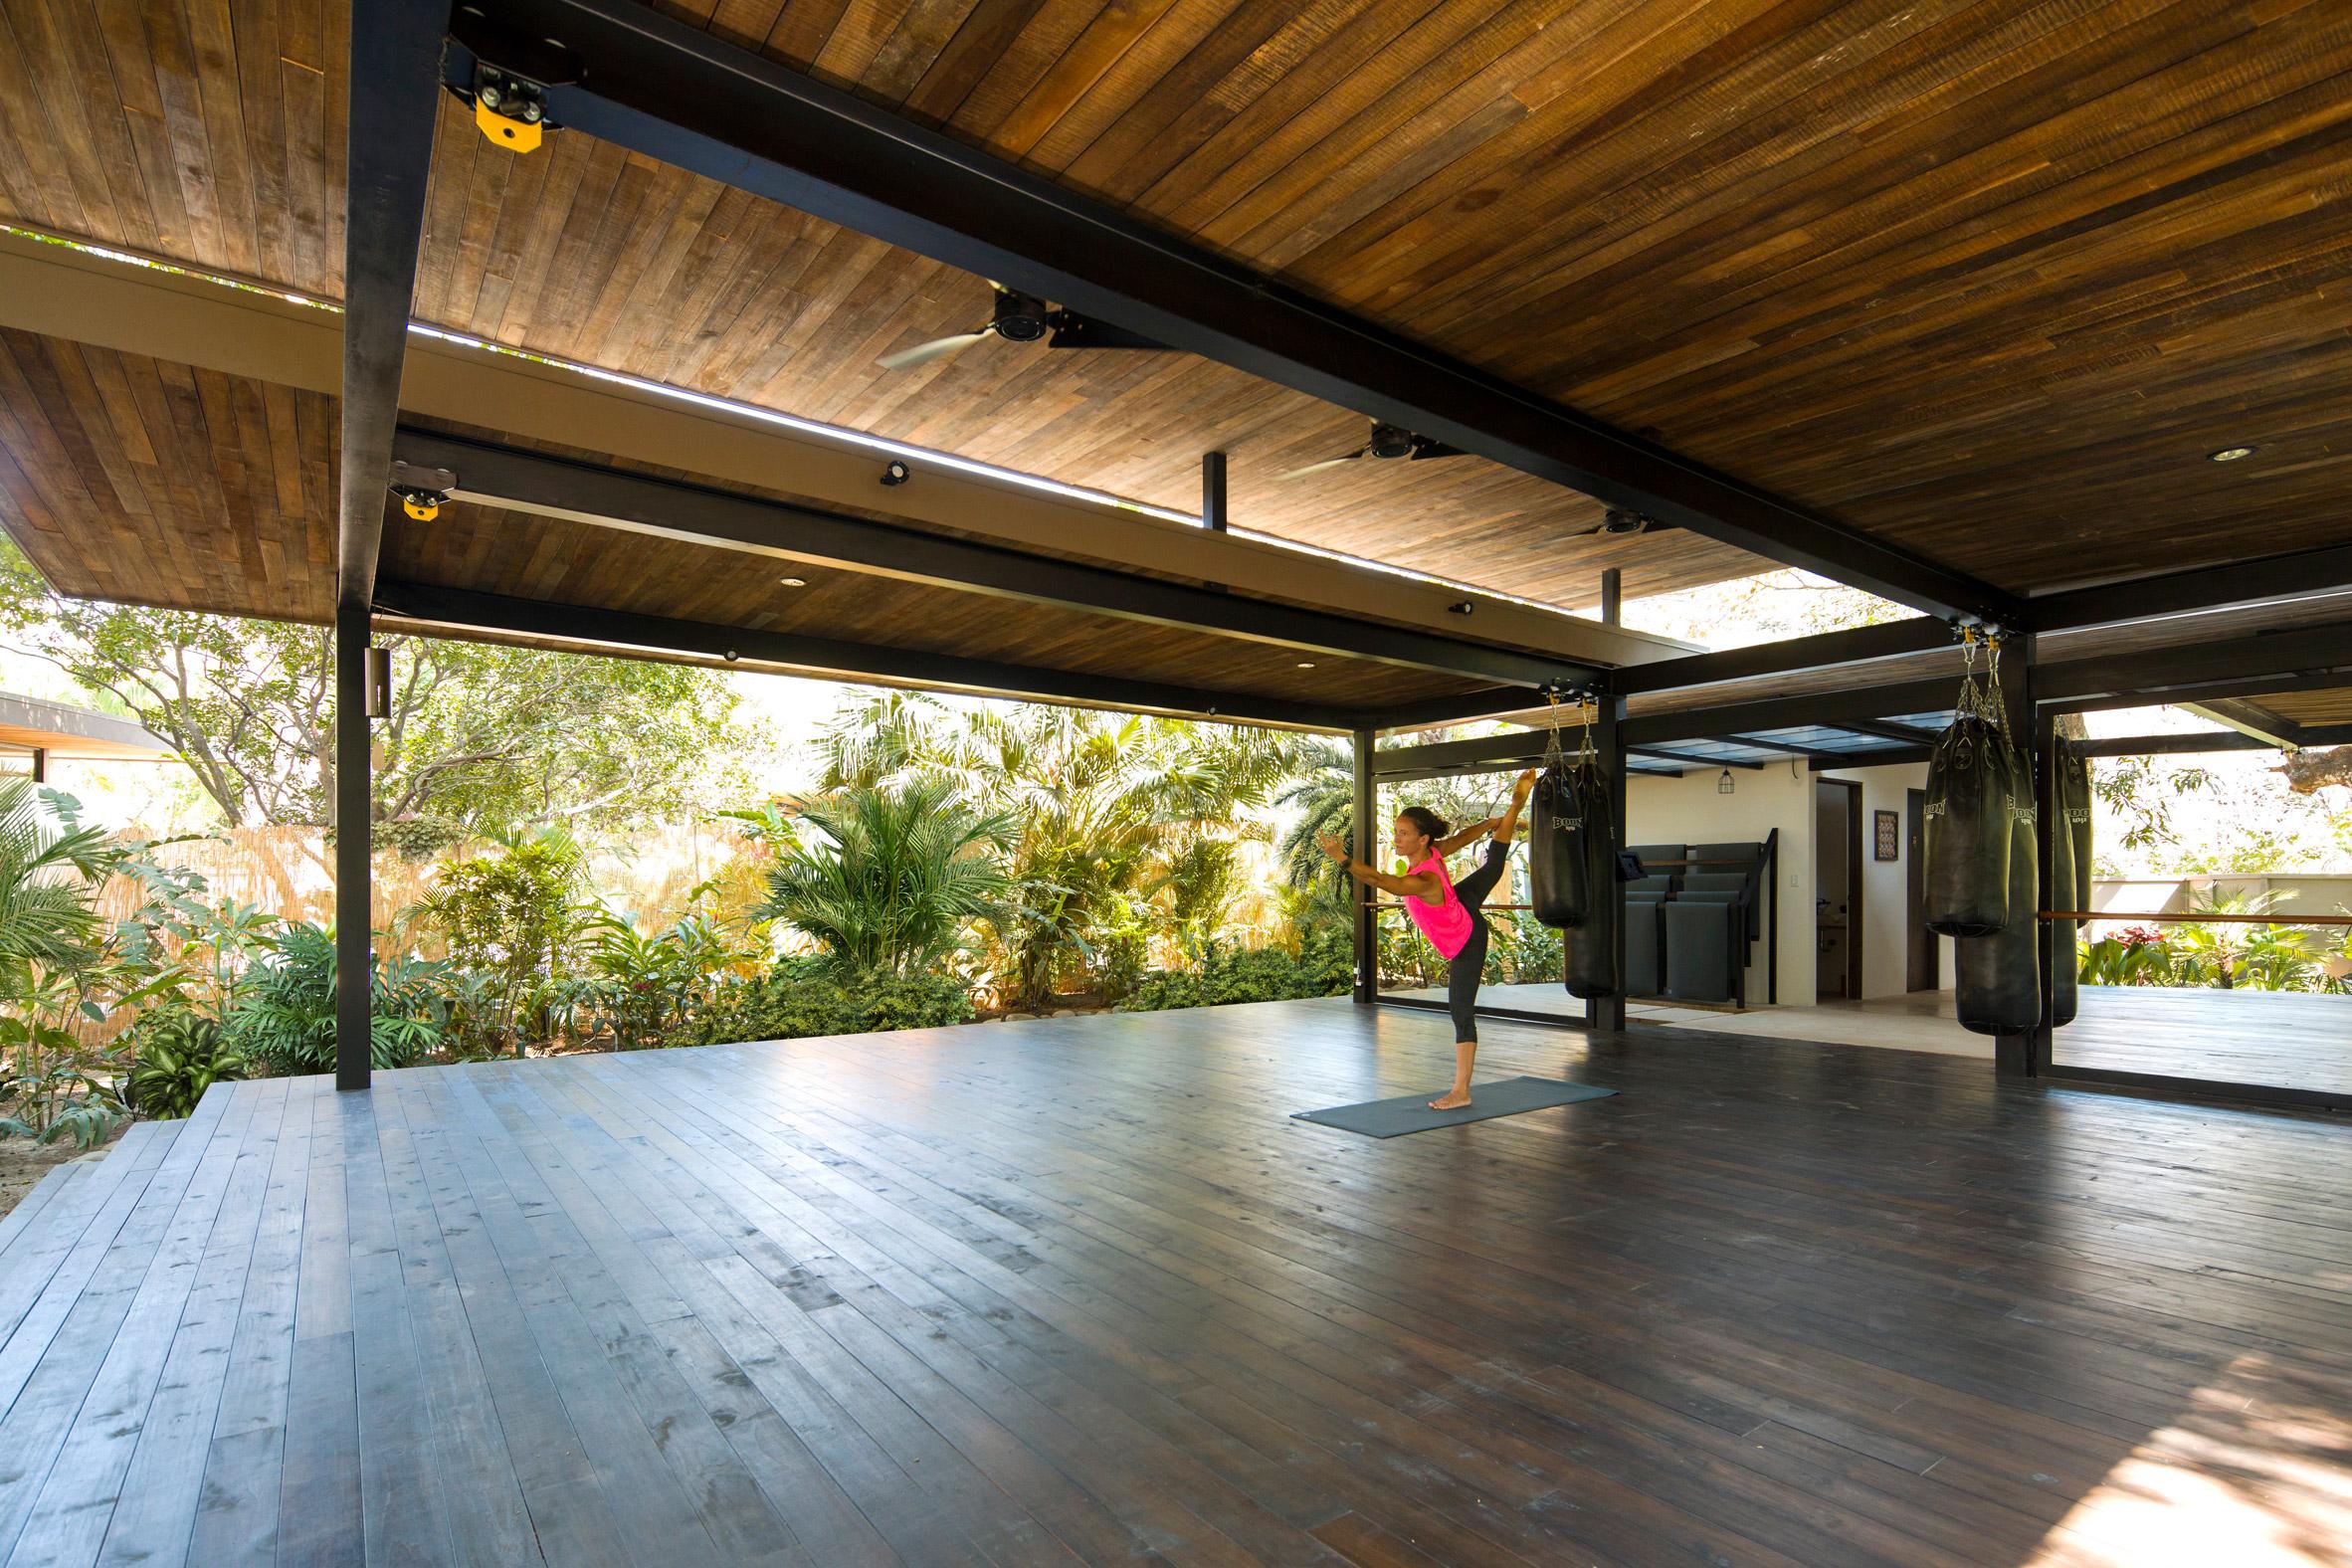 Nalu boutique hotel and yoga studio, Costa Rica, by Studio Saxe